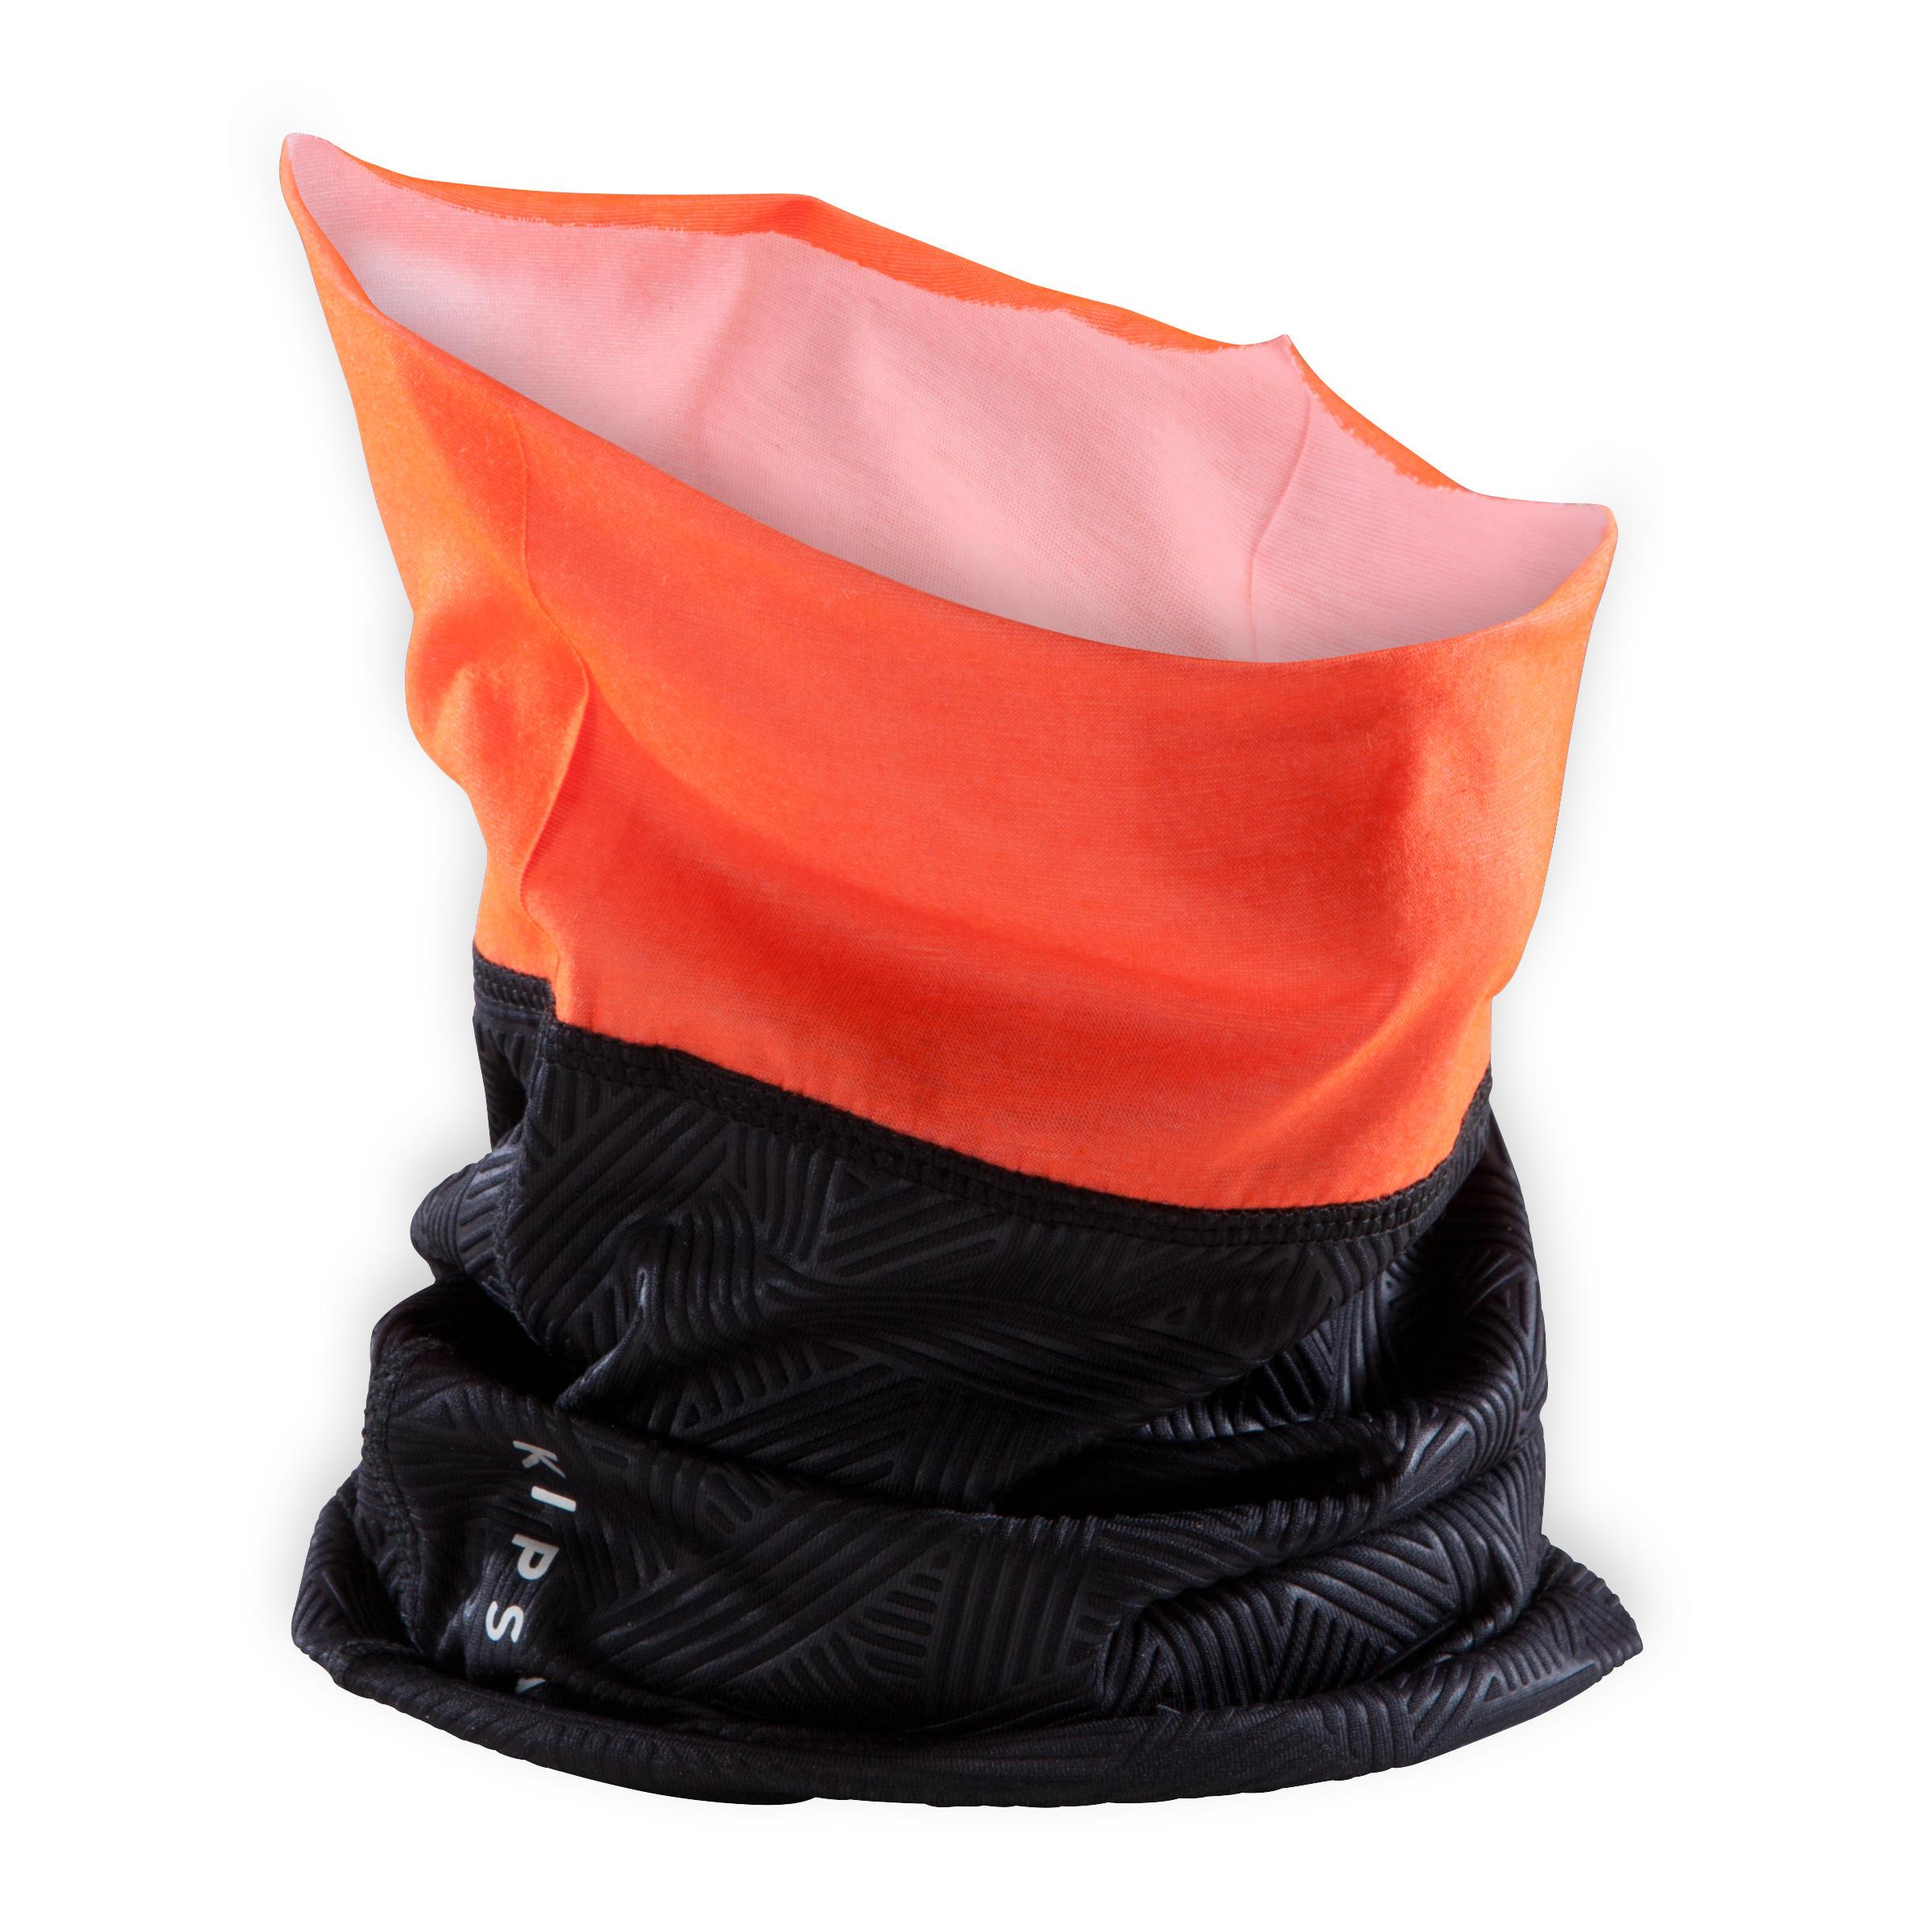 Keepdry 500 Neck Warmer - Neon Orange/Black